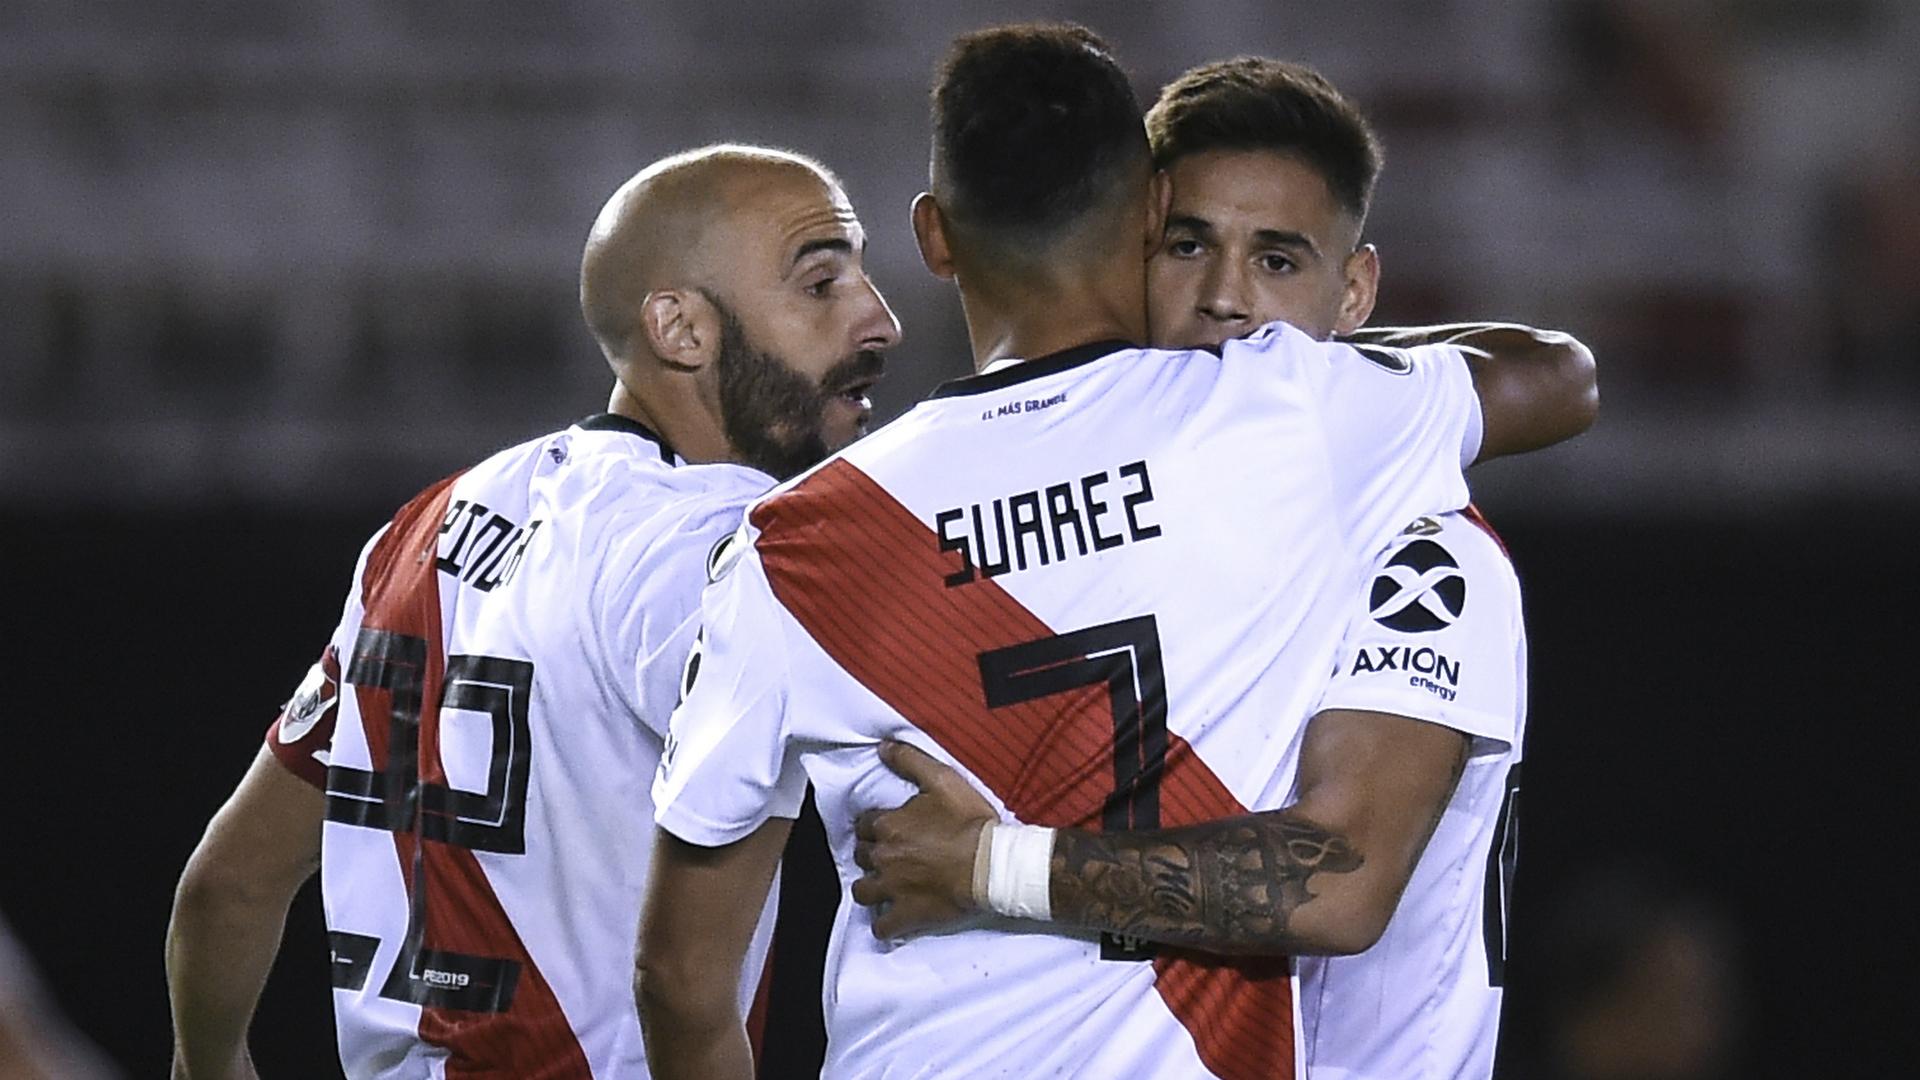 Copa Libertadores Review: River win first game, ruthless Flamengo score six goals